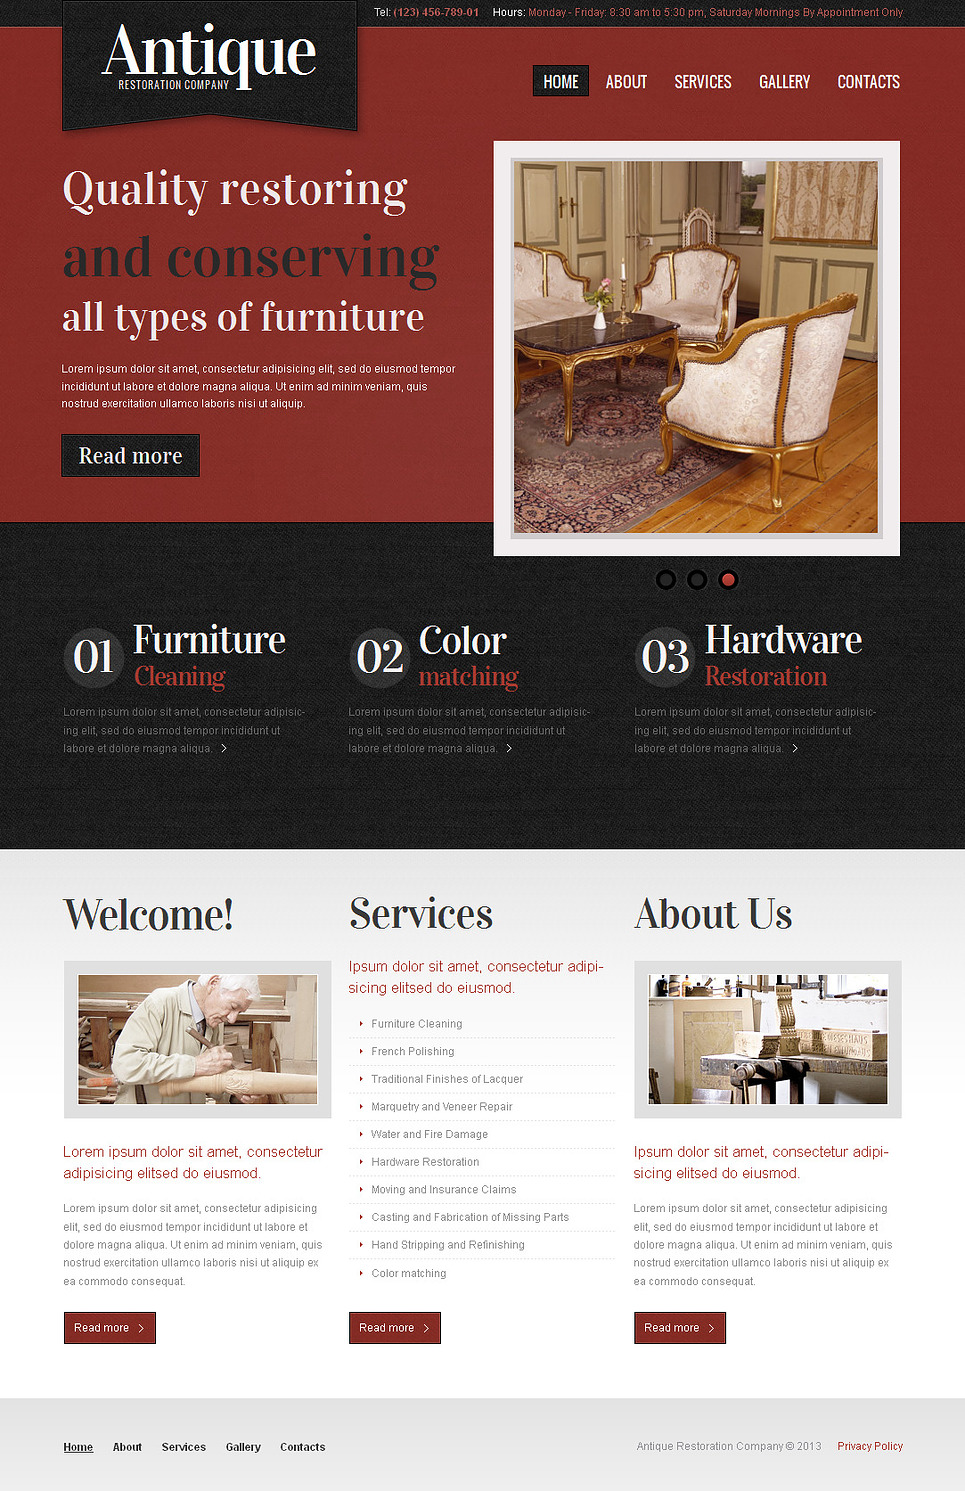 Antique Website Template for Restoration Company - image